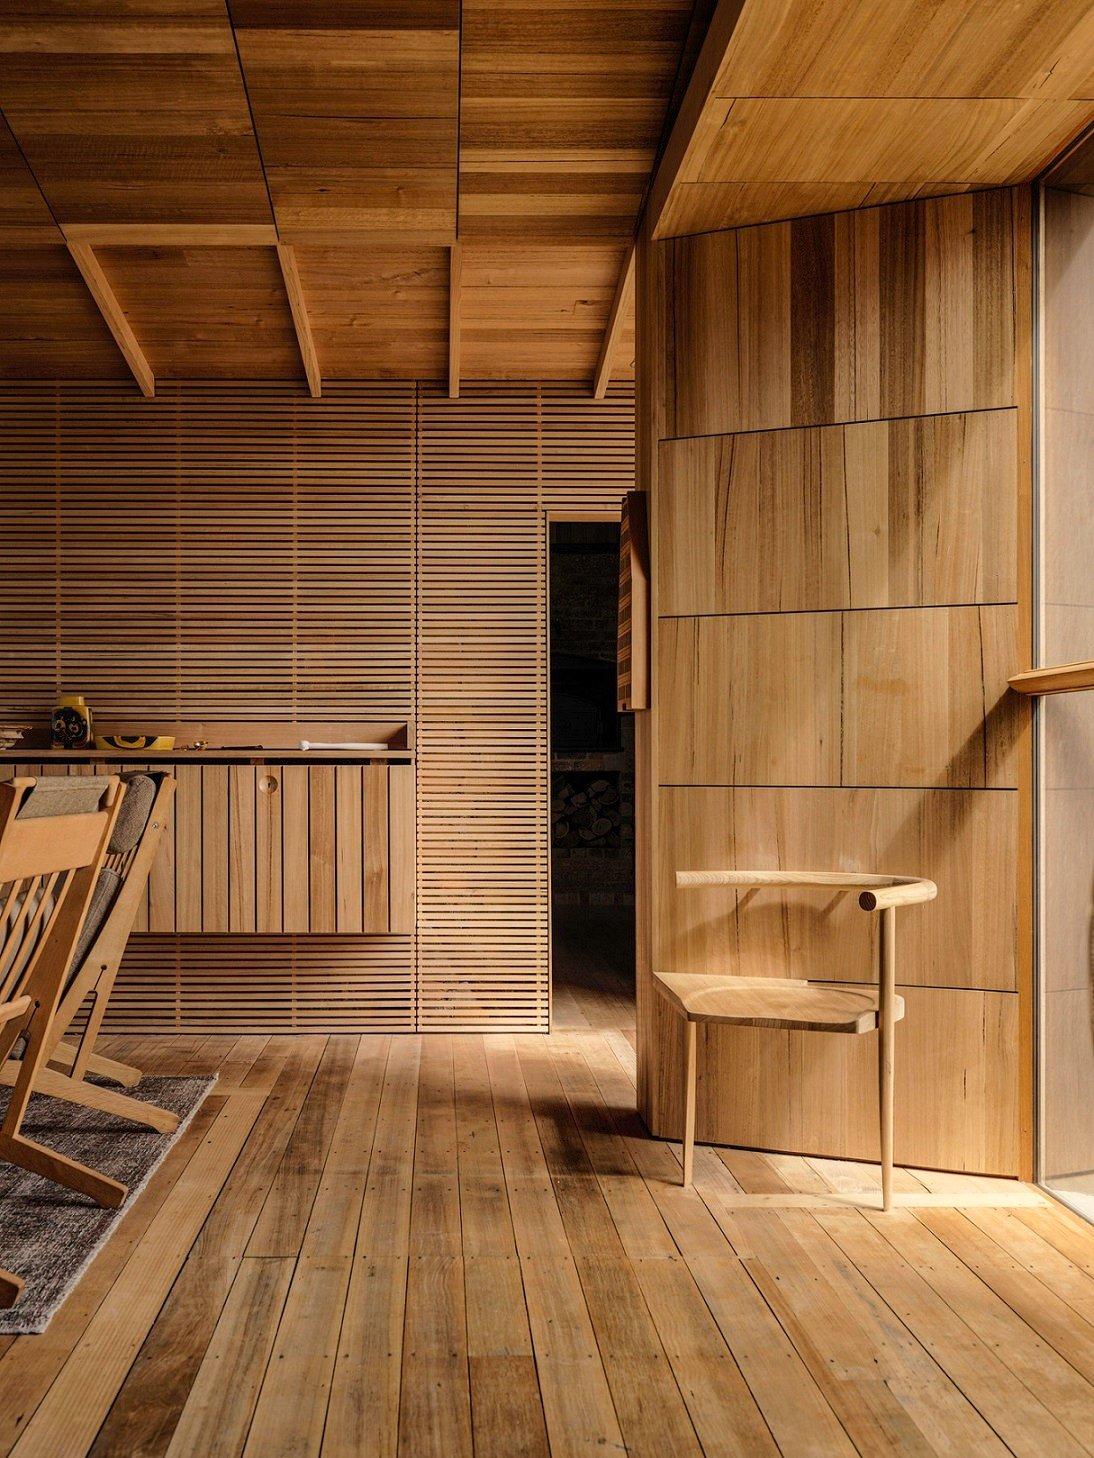 Tasmanian Oak is used for internal walls, linings, floor and ceiling Trevor Mein